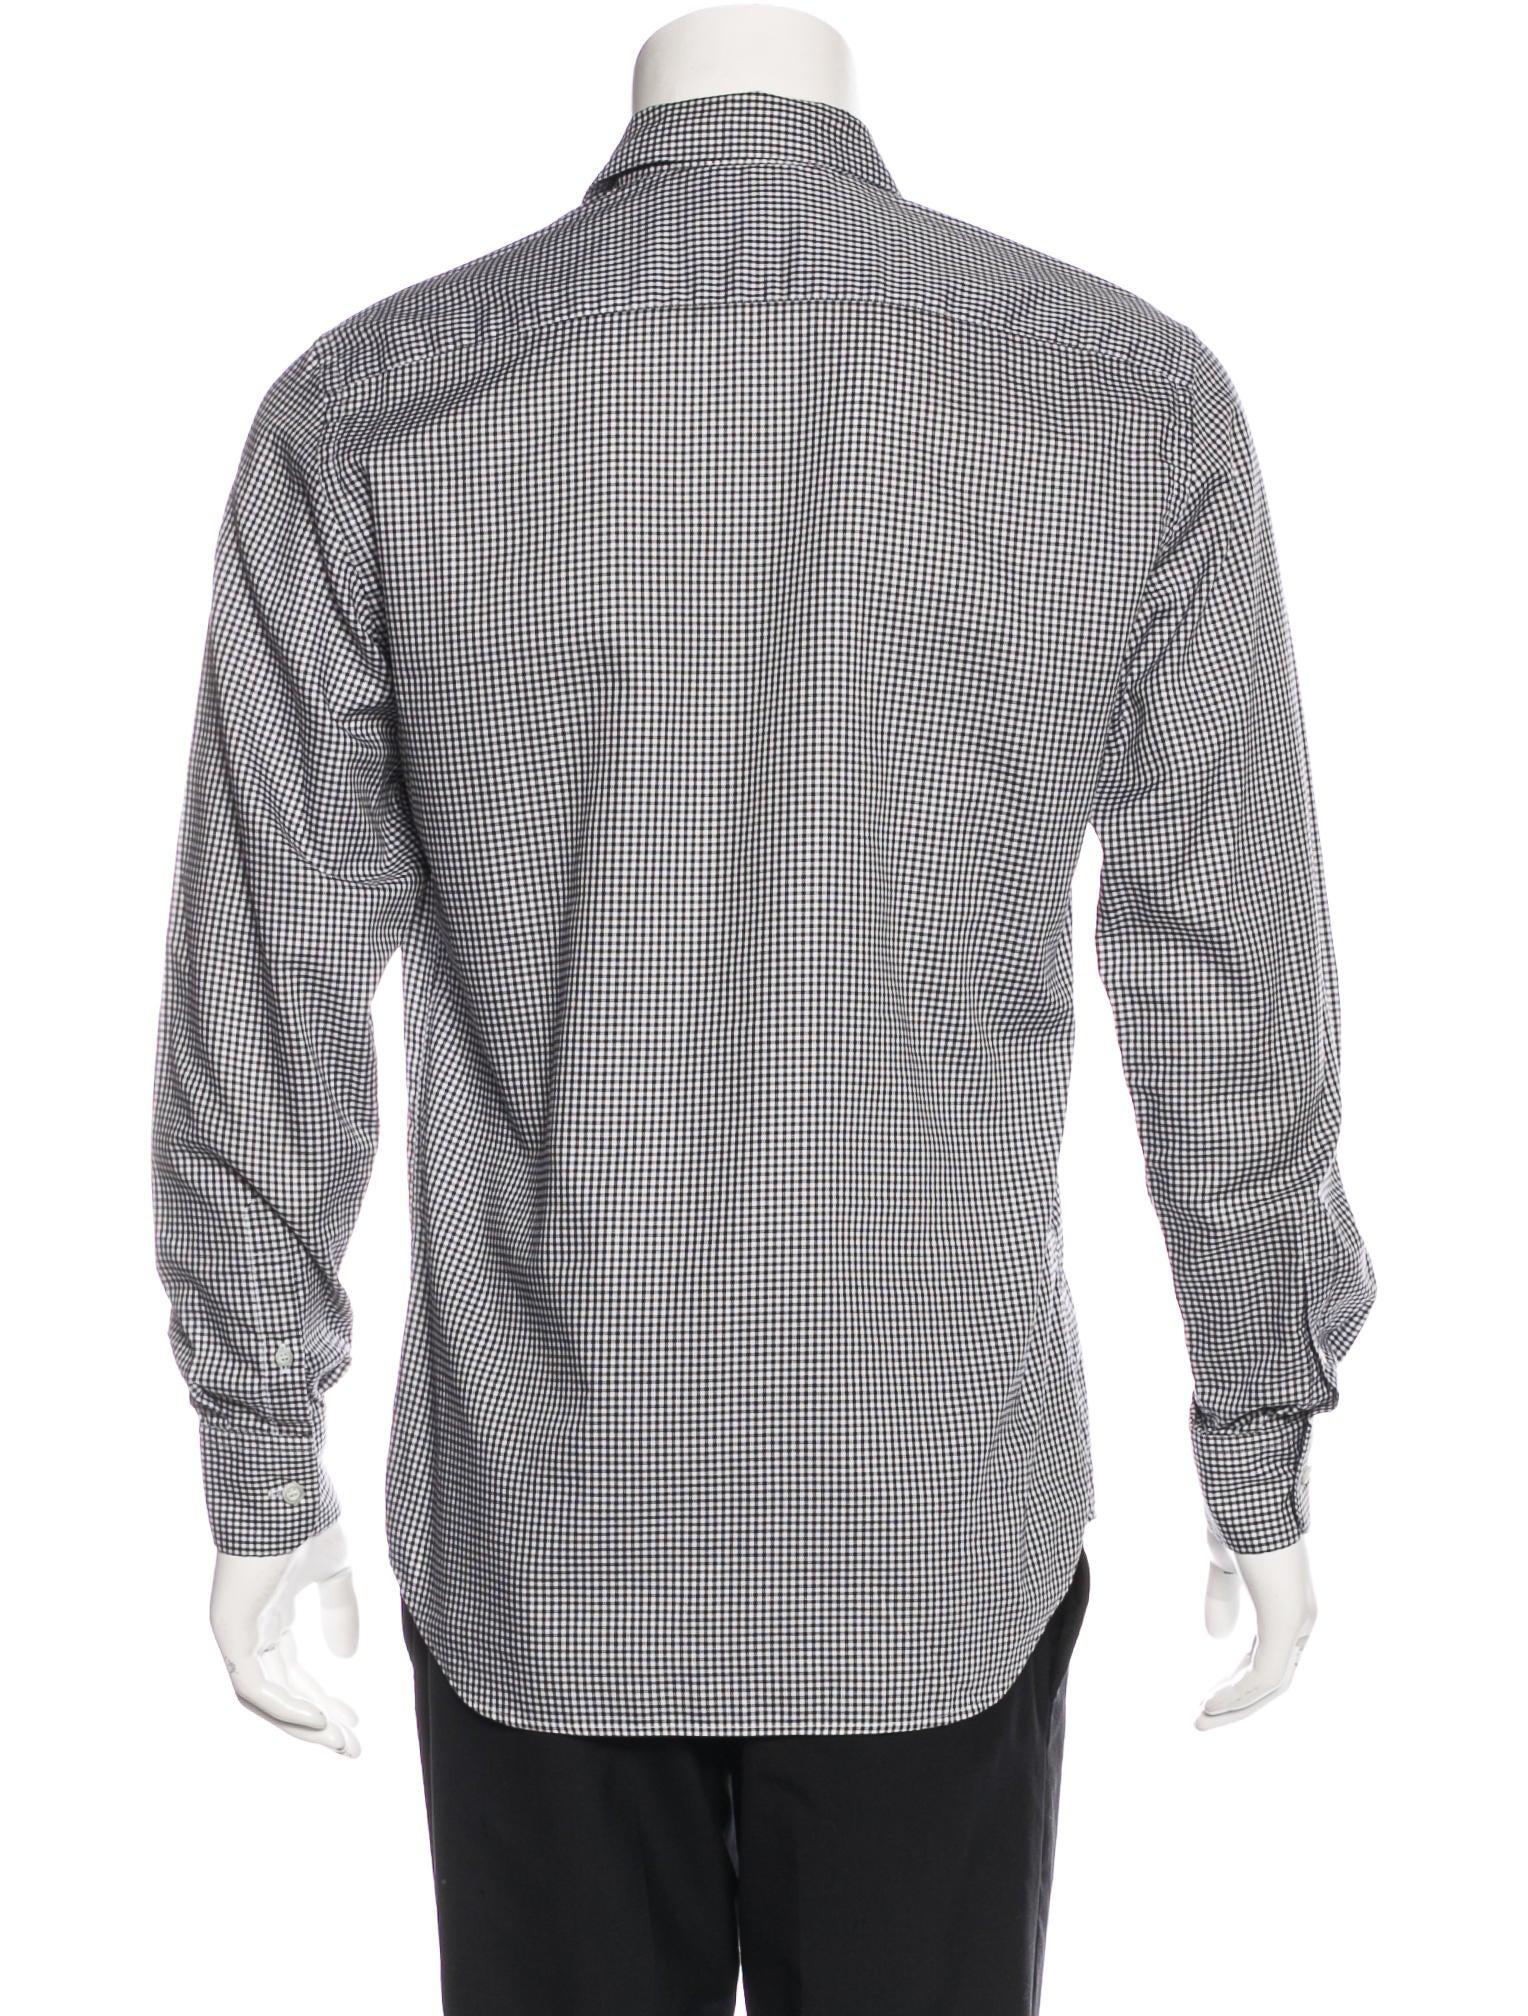 Prada gingham dress shirt clothing pra133592 the for Gingham dress shirt men